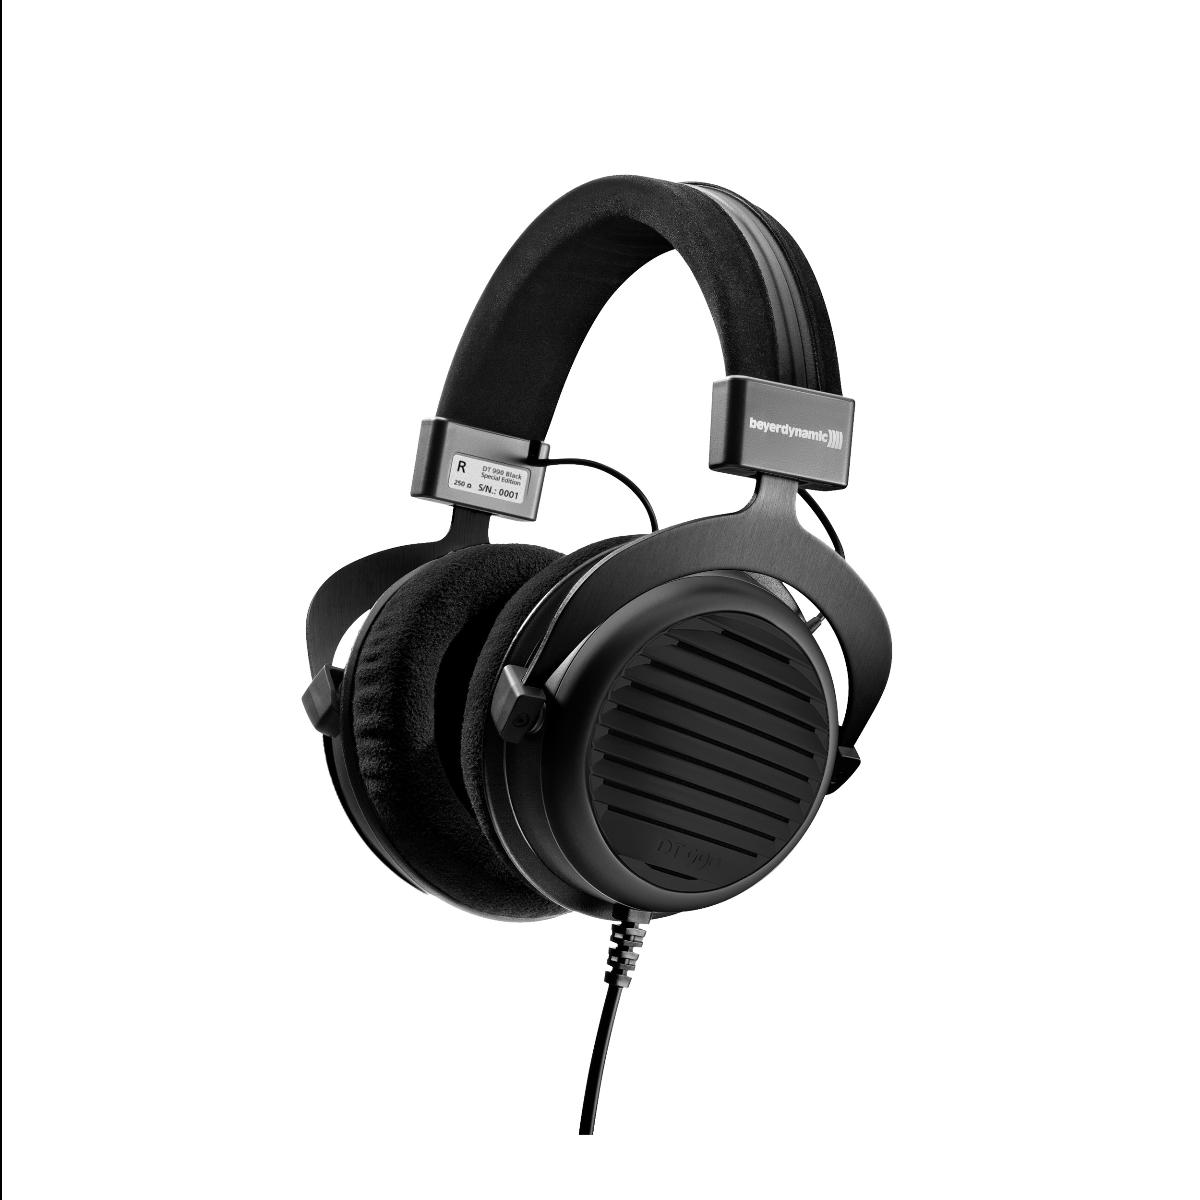 Kopfhoerer - beyerdynamic DT 990 Black Special Edition (250 Ohm) - Onlineshop Beyerdynamic